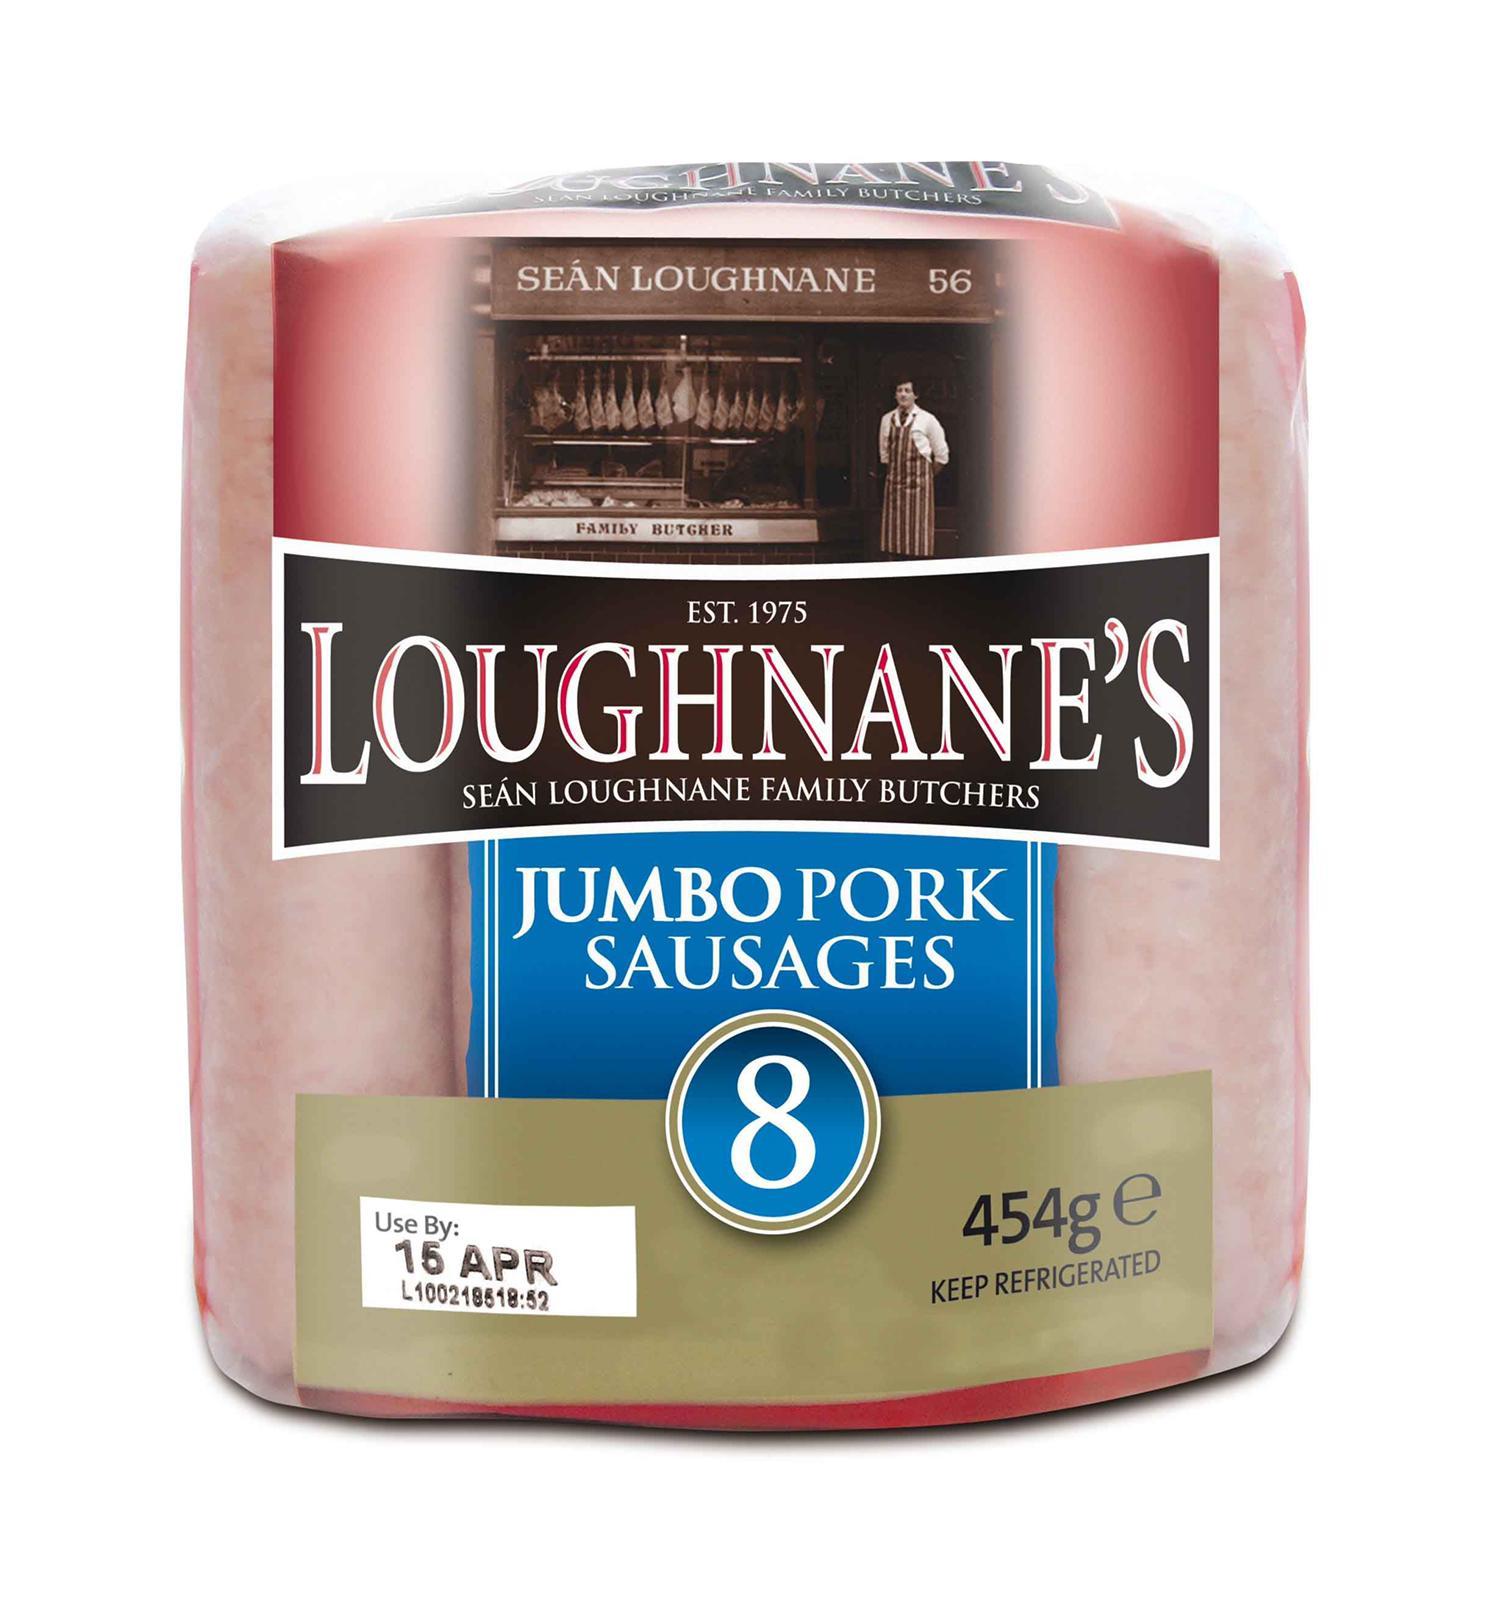 Loughnanes 8 Jumbo Pork Sausages 454g